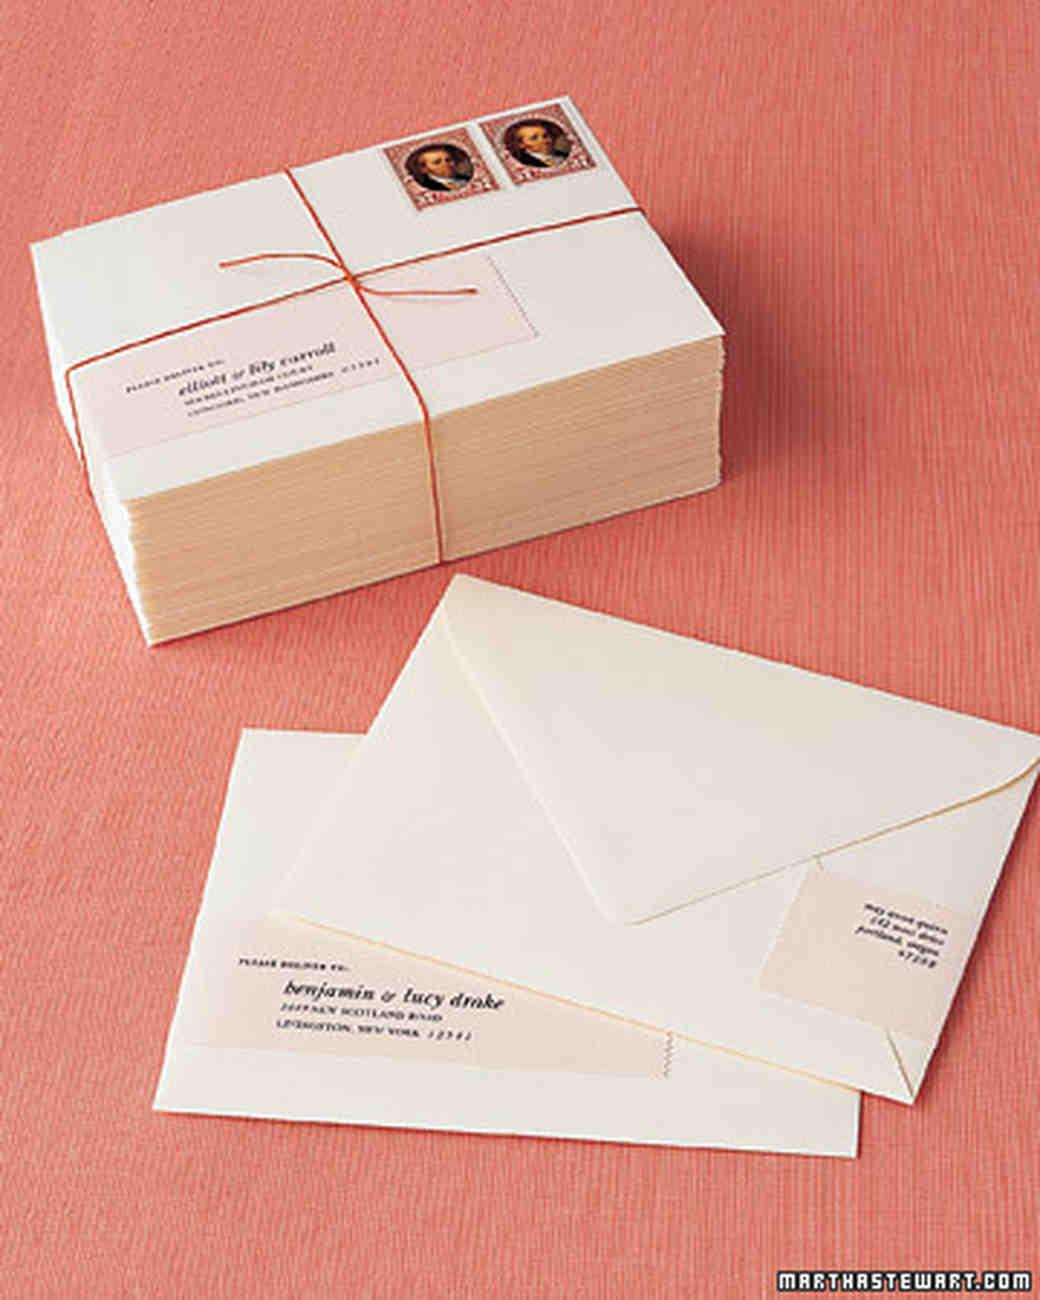 Easy Ways To Upgrade Your Wedding Invitations | Martha Stewart Weddings